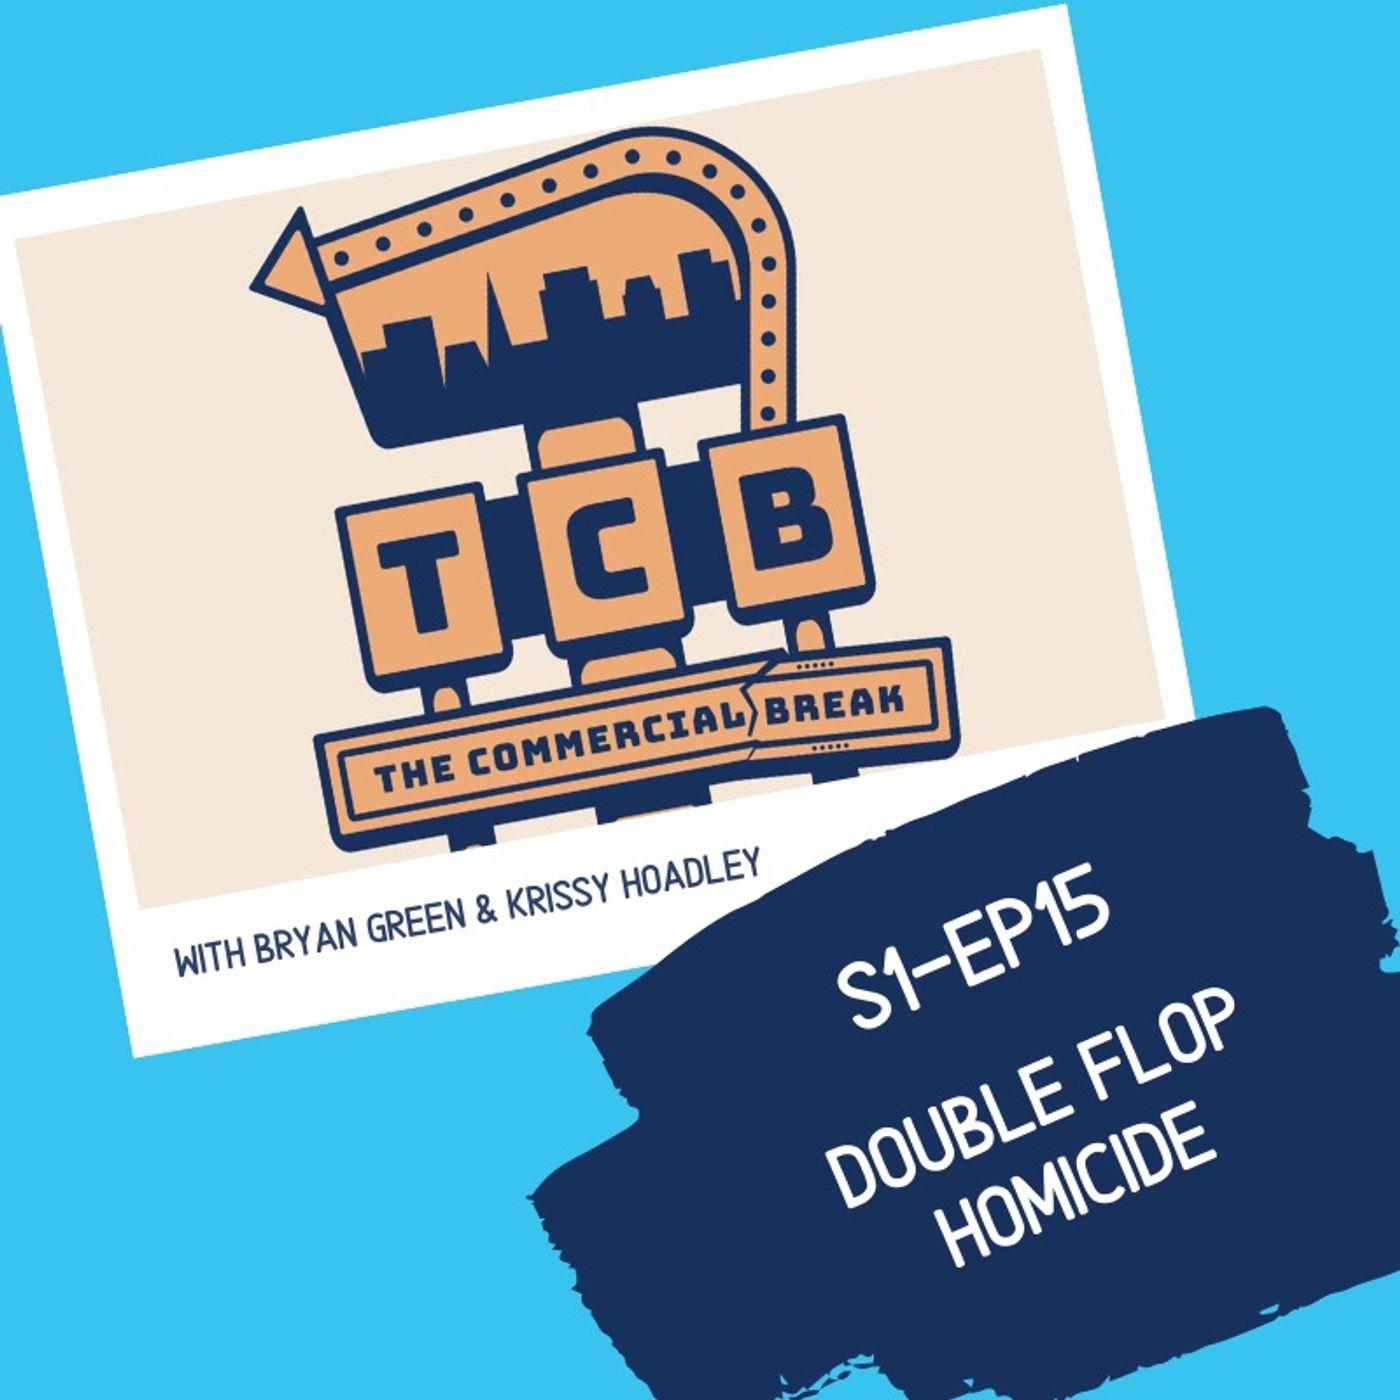 S1-EP15: Double Flop Homicide